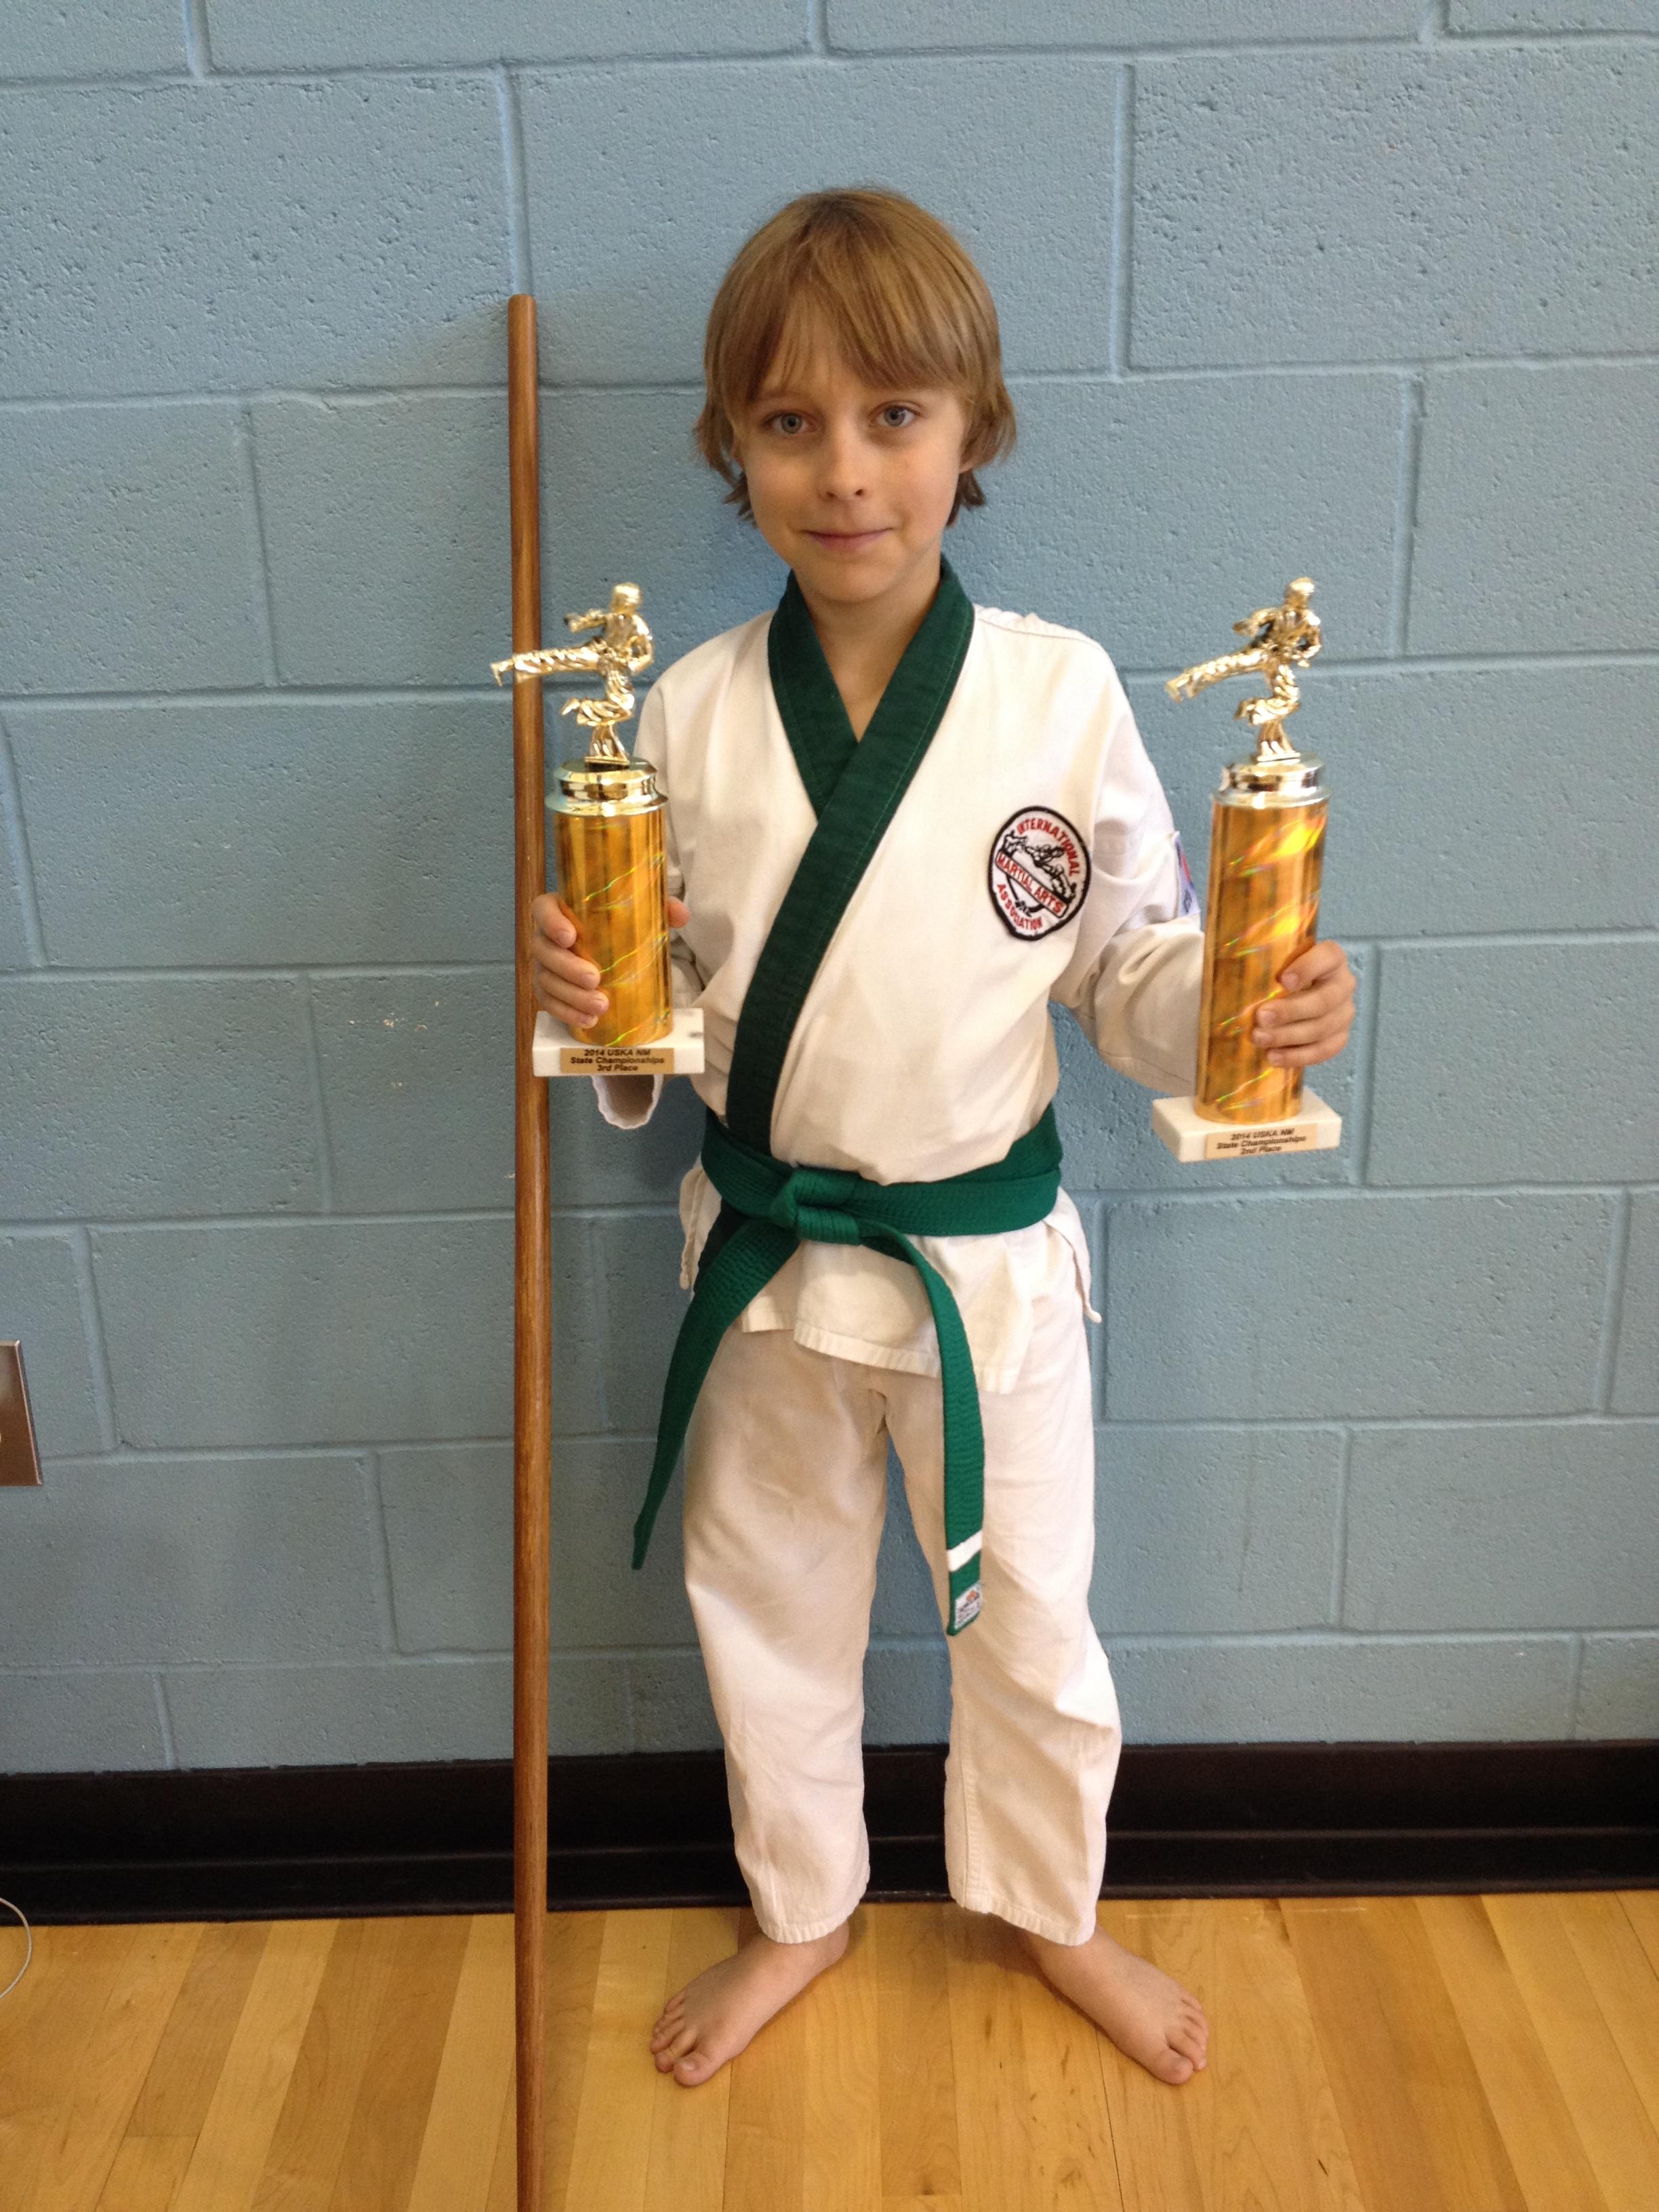 Martial arts champion